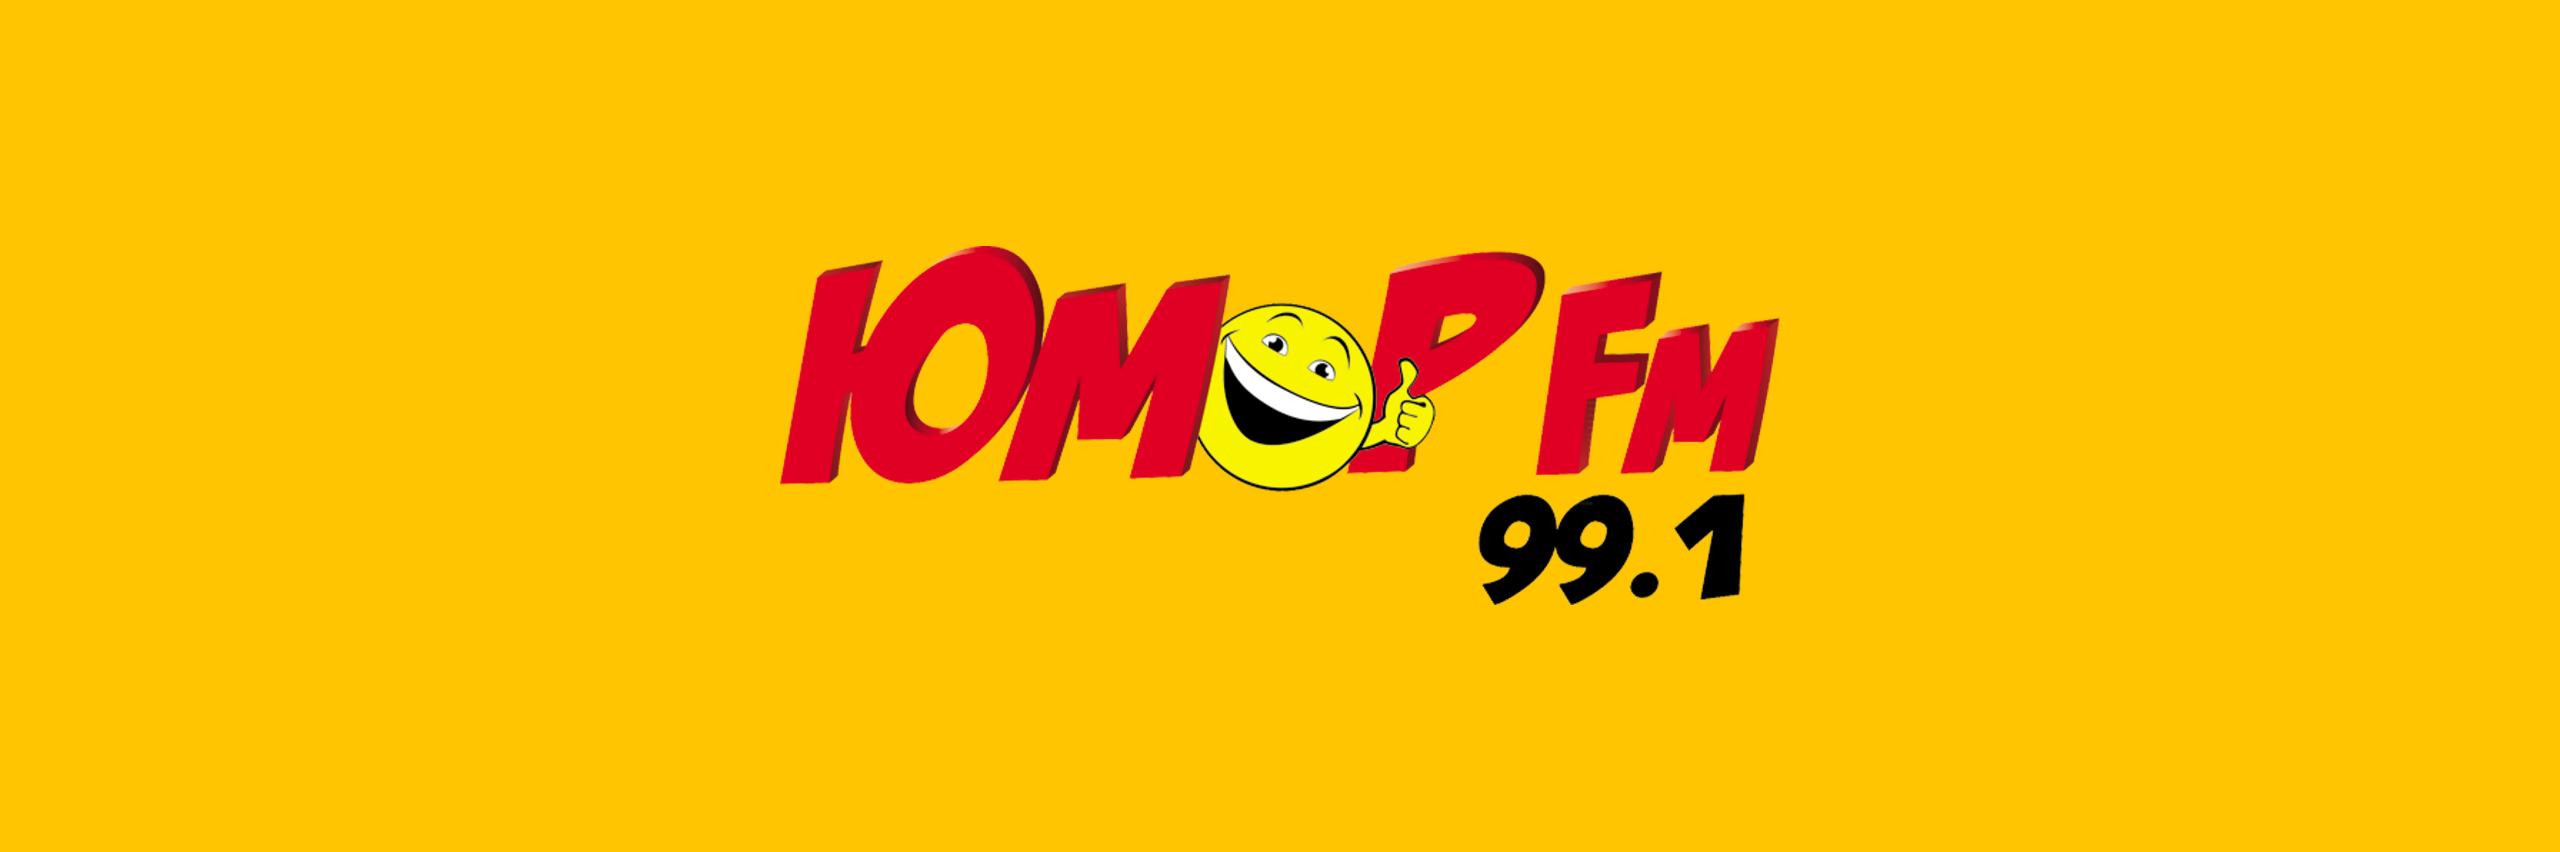 Юмор FM - Воронеж